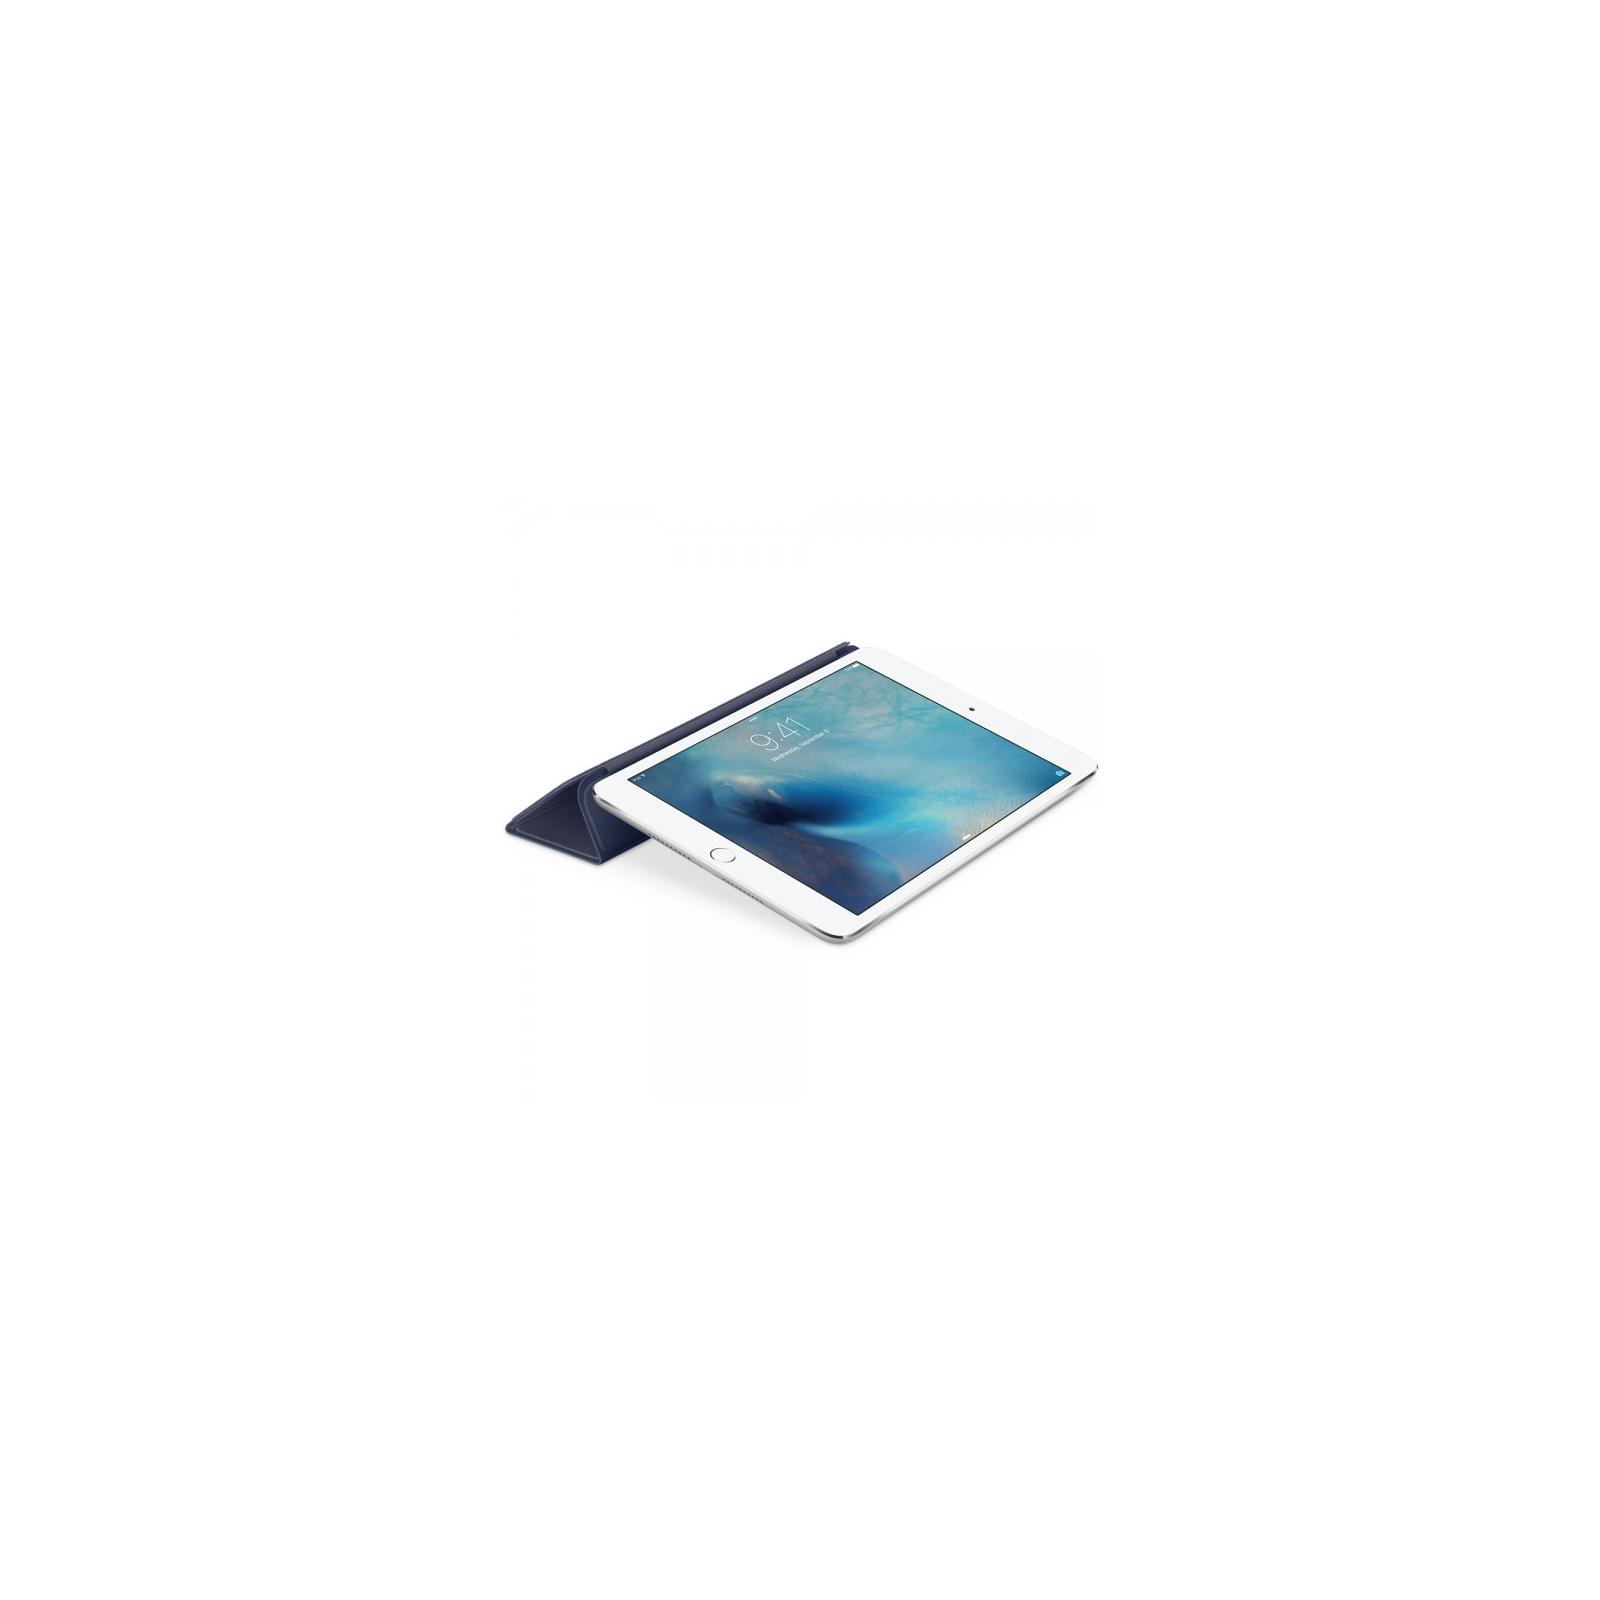 Чехол для планшета Apple Smart Cover для iPad mini 4 Midnight Blue (MKLX2ZM/A) изображение 4